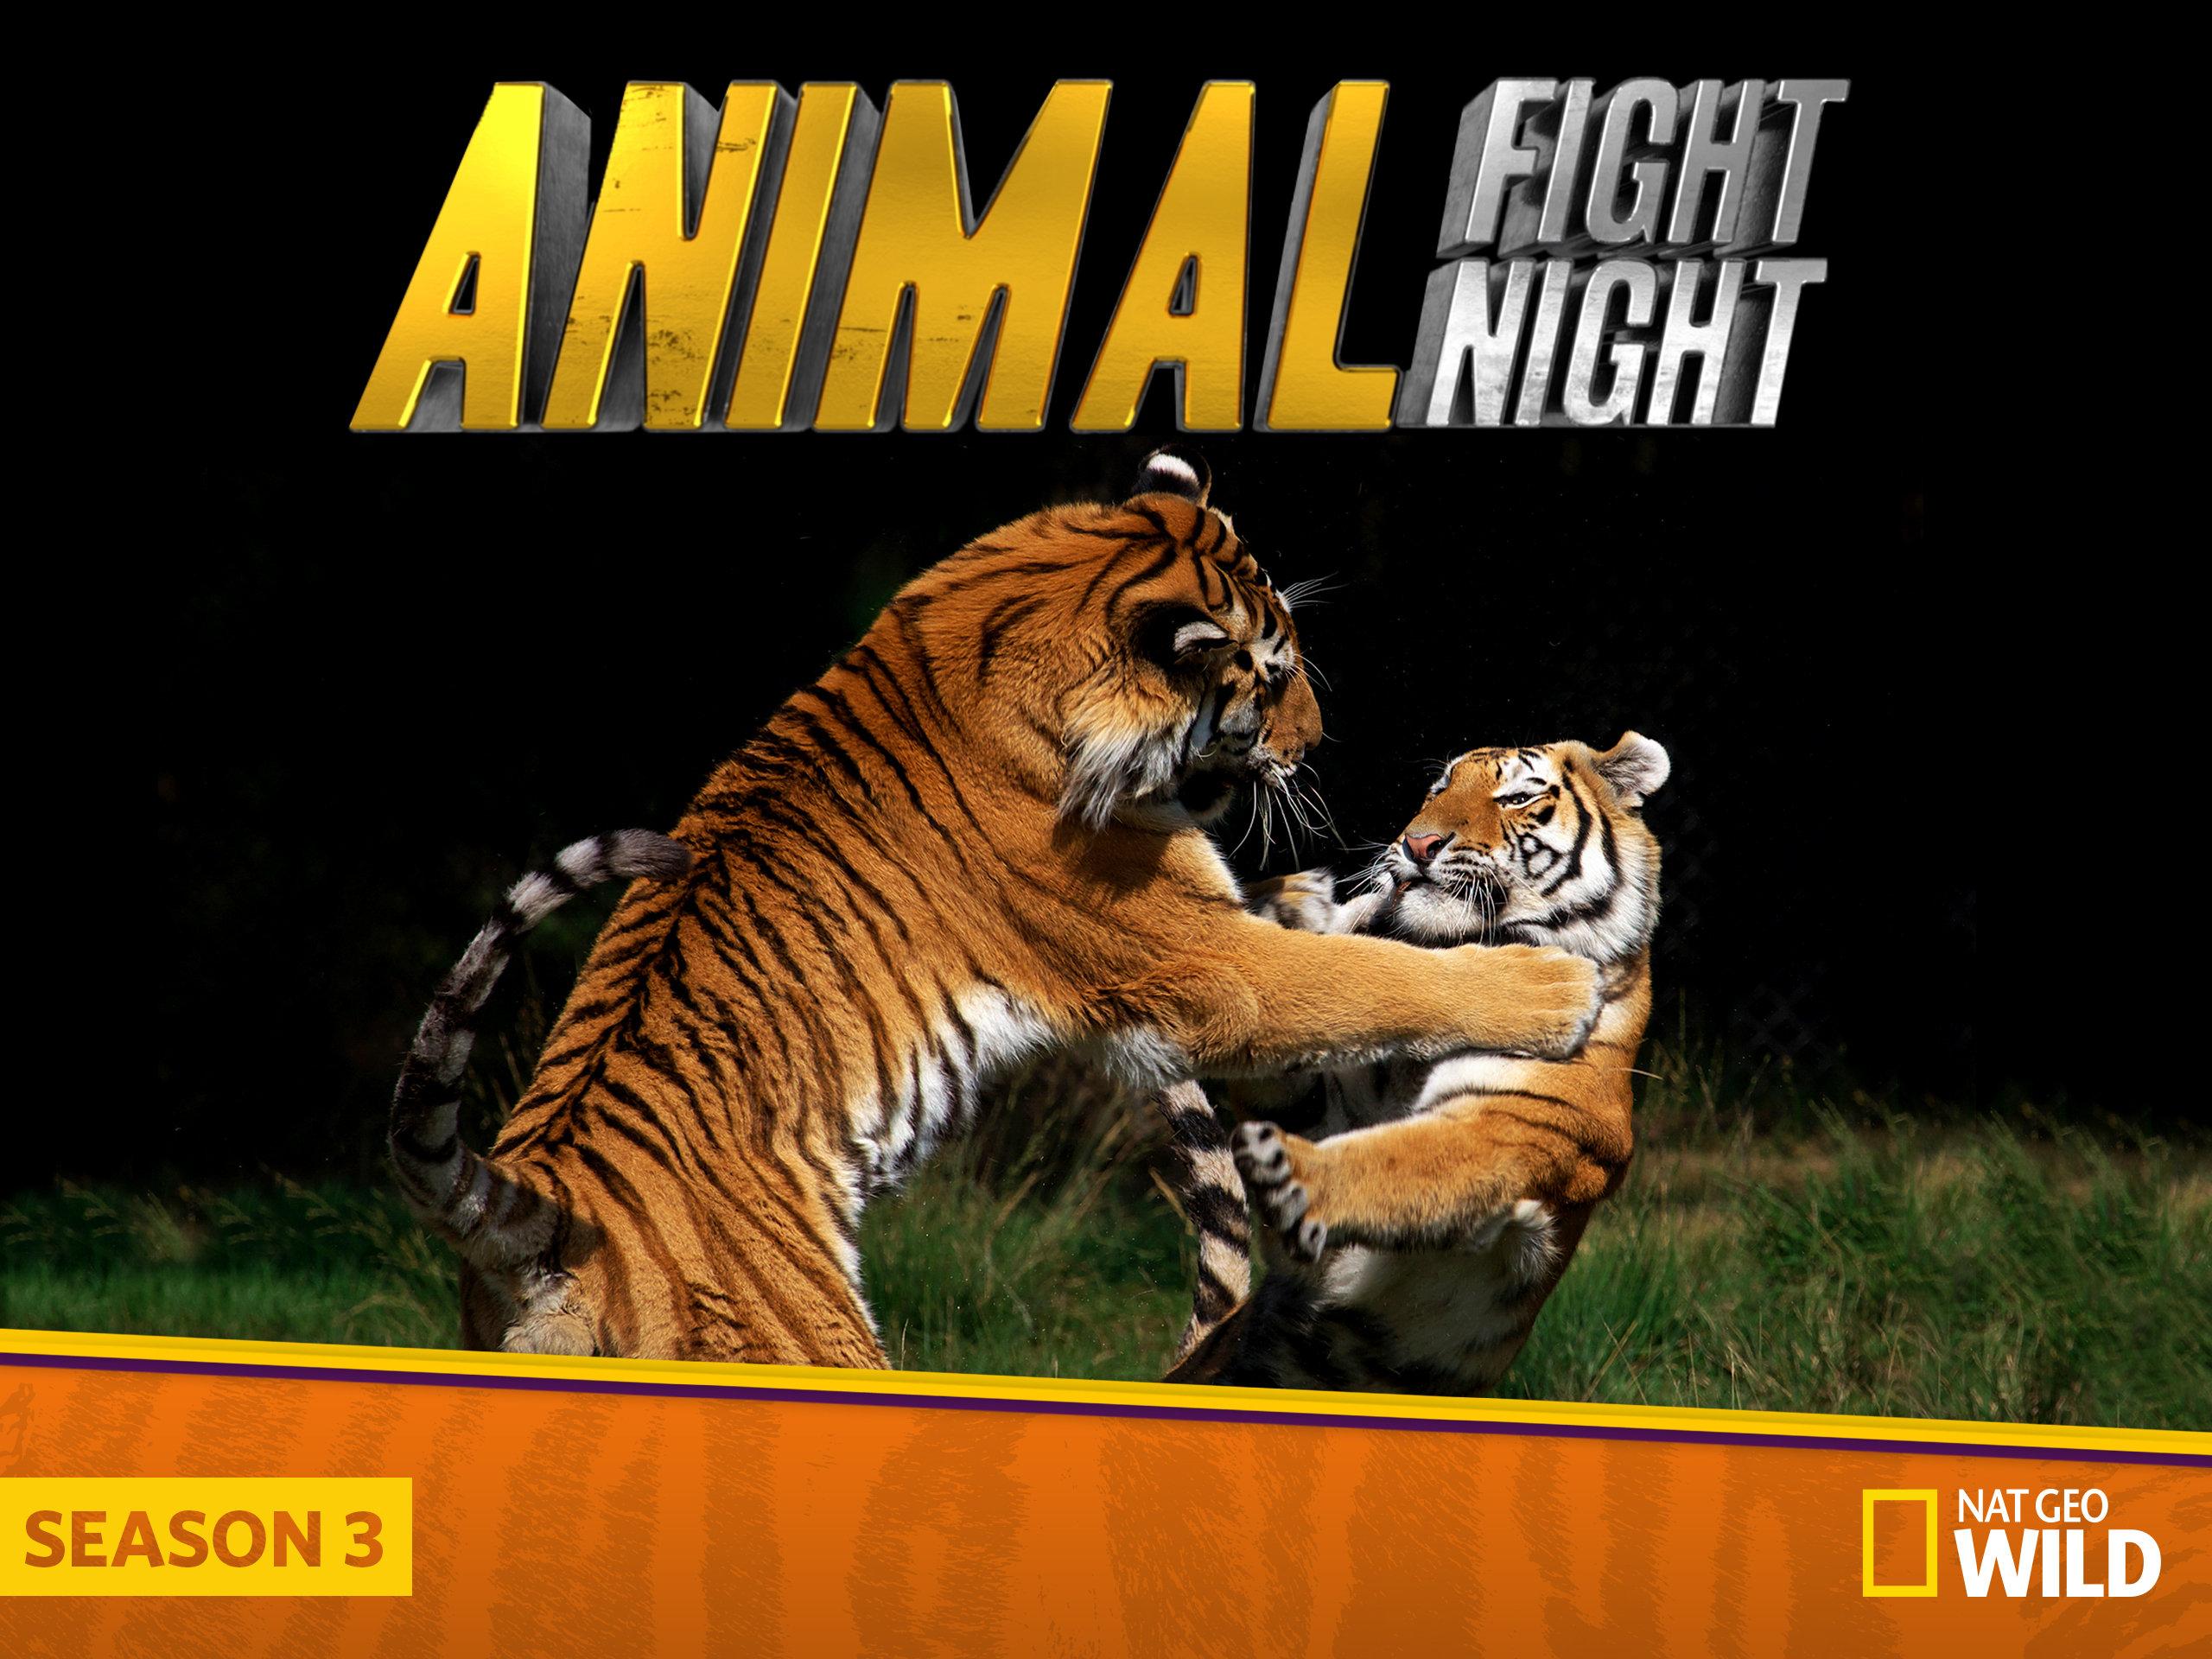 Watch Animal Fight Night Season 3 Episode 2: Brutal Brawls